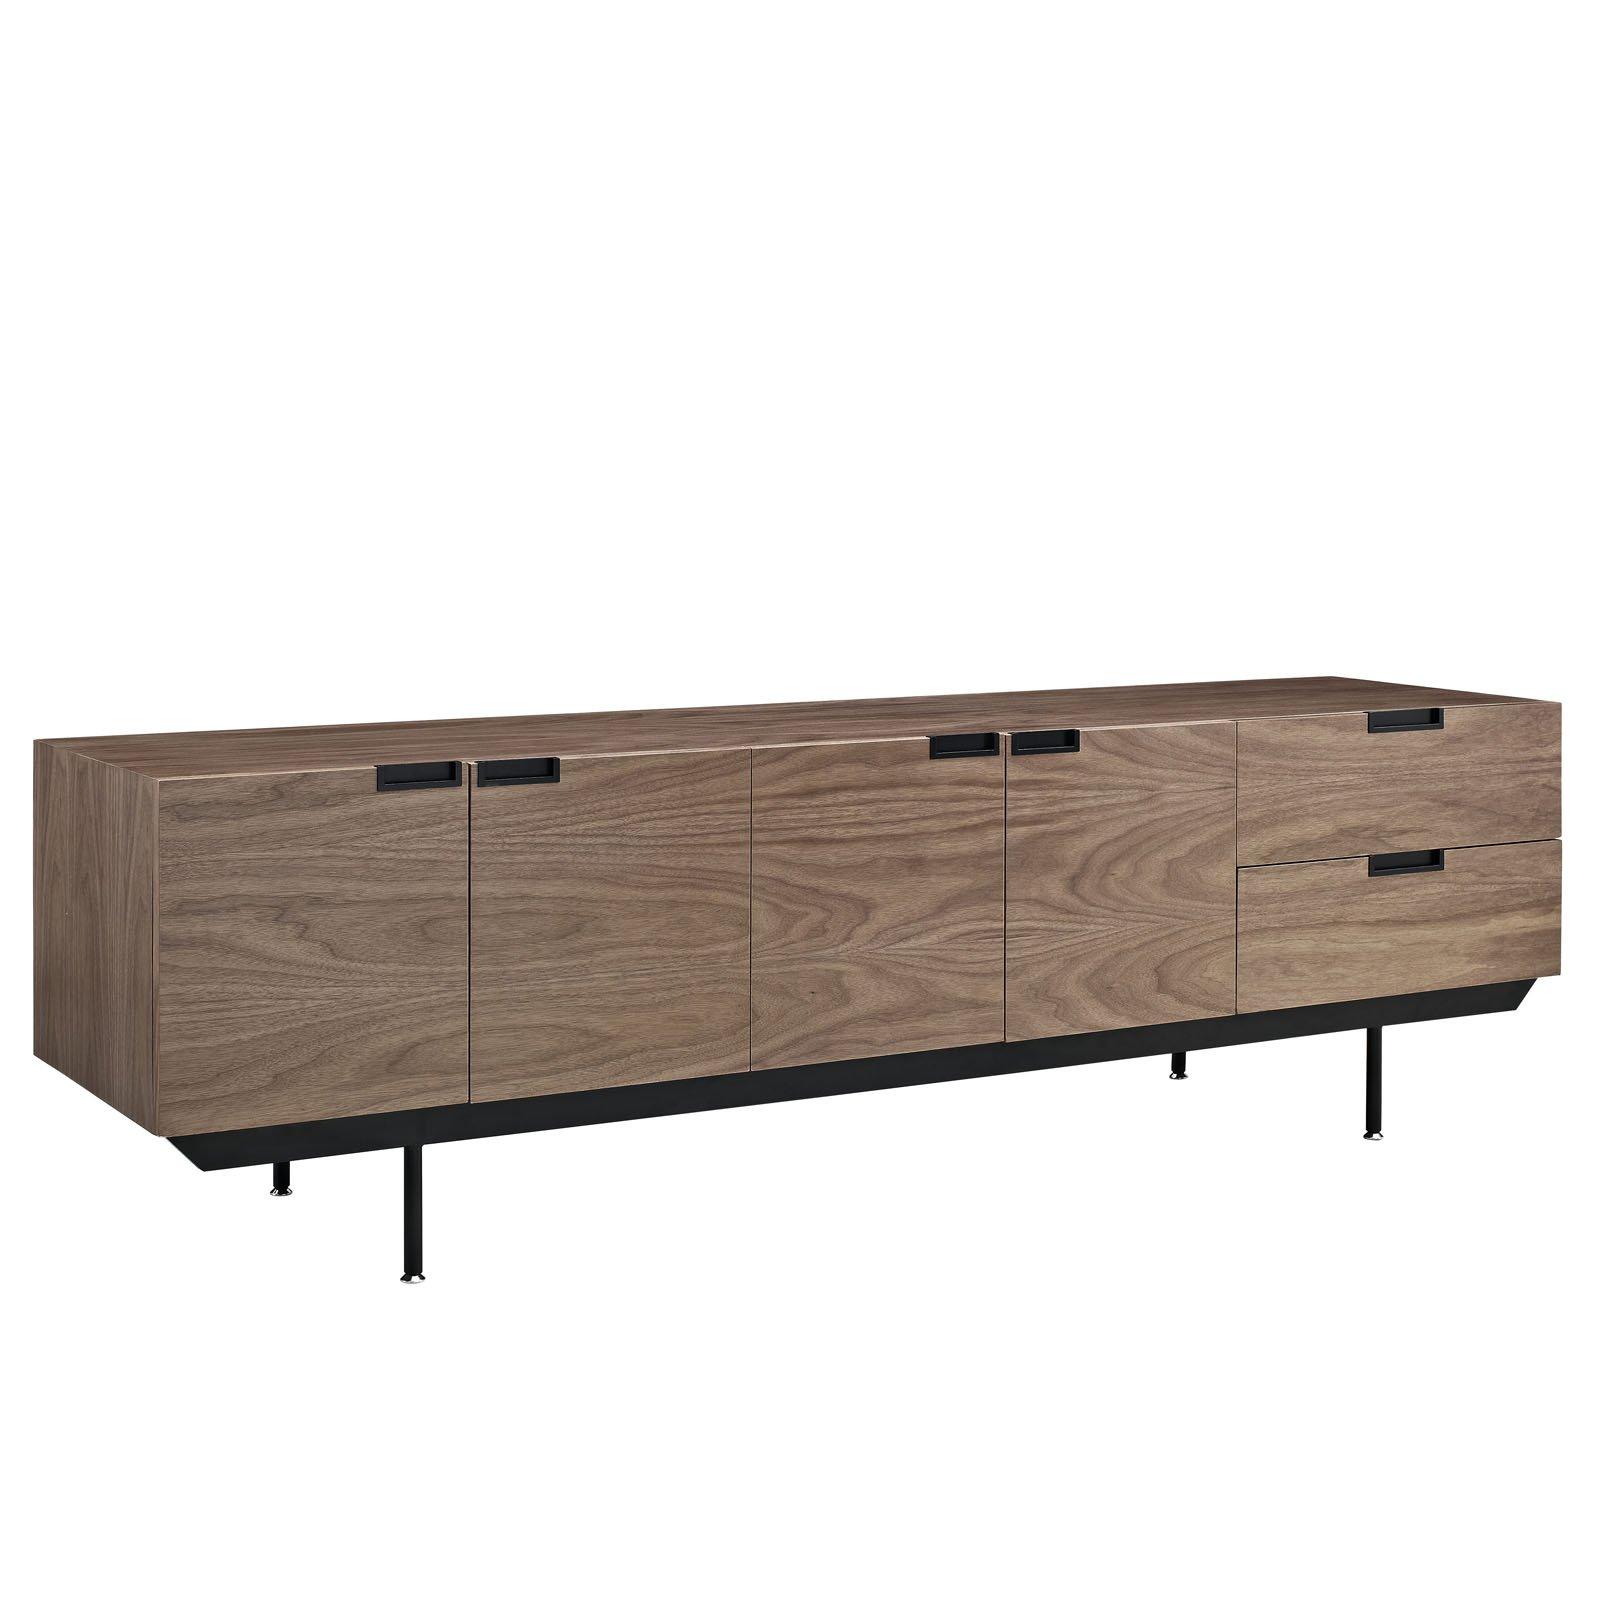 Modway Herald Flat Screen TV Stand Credenza - Sideboard - Buffet Server In Dark Walnut - Mid-Century Modern - 60 - 65 - 70 - 75 - 80 Inch Flat Screen